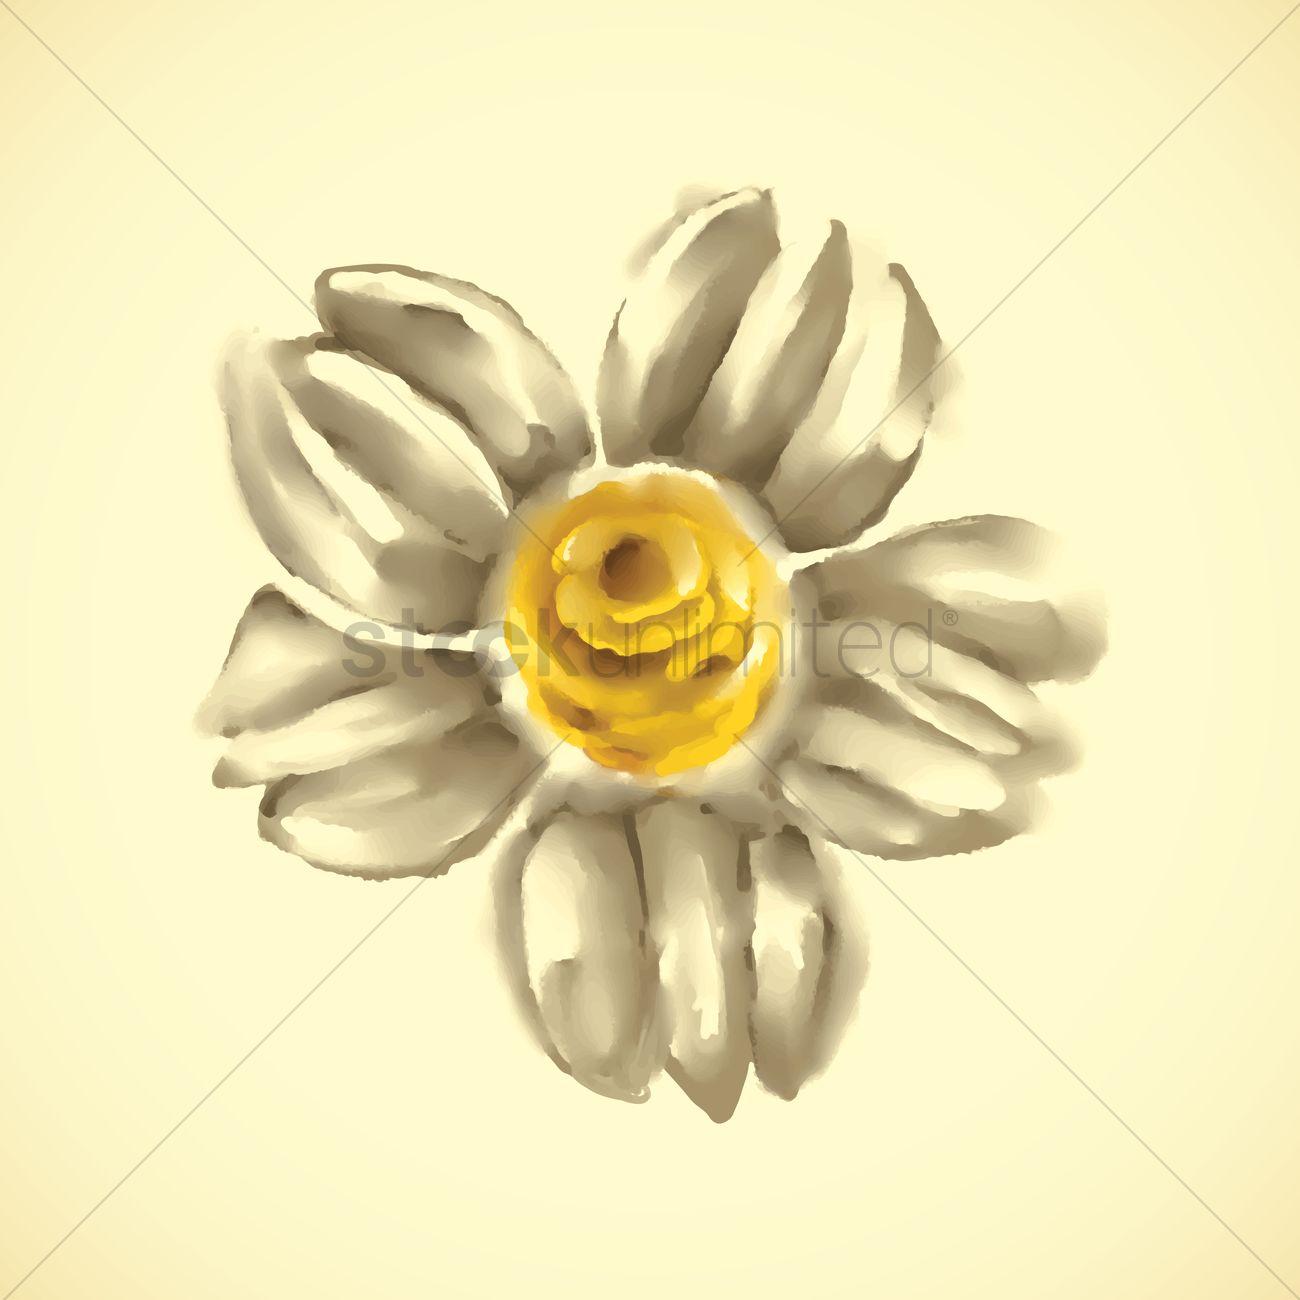 Jasmine Flower Vector Image 1626931 Stockunlimited